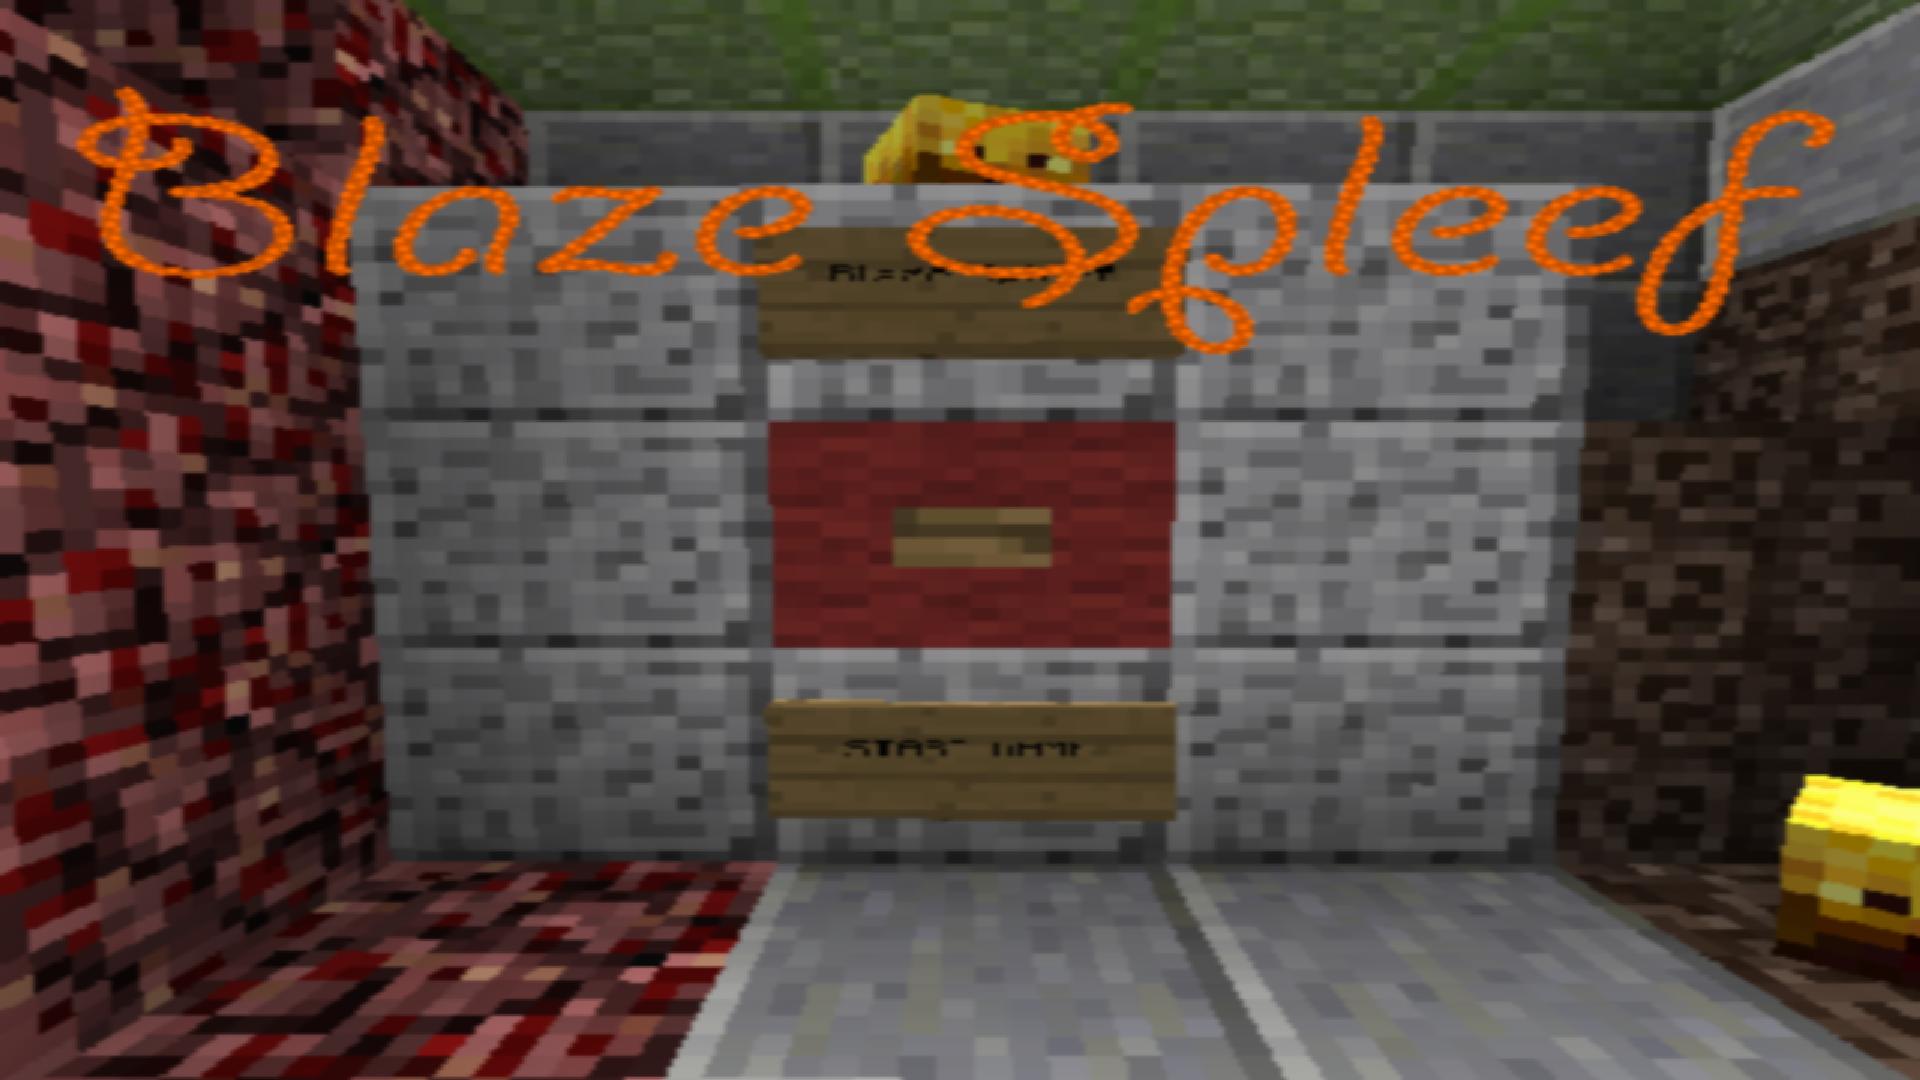 Blaze Spleef